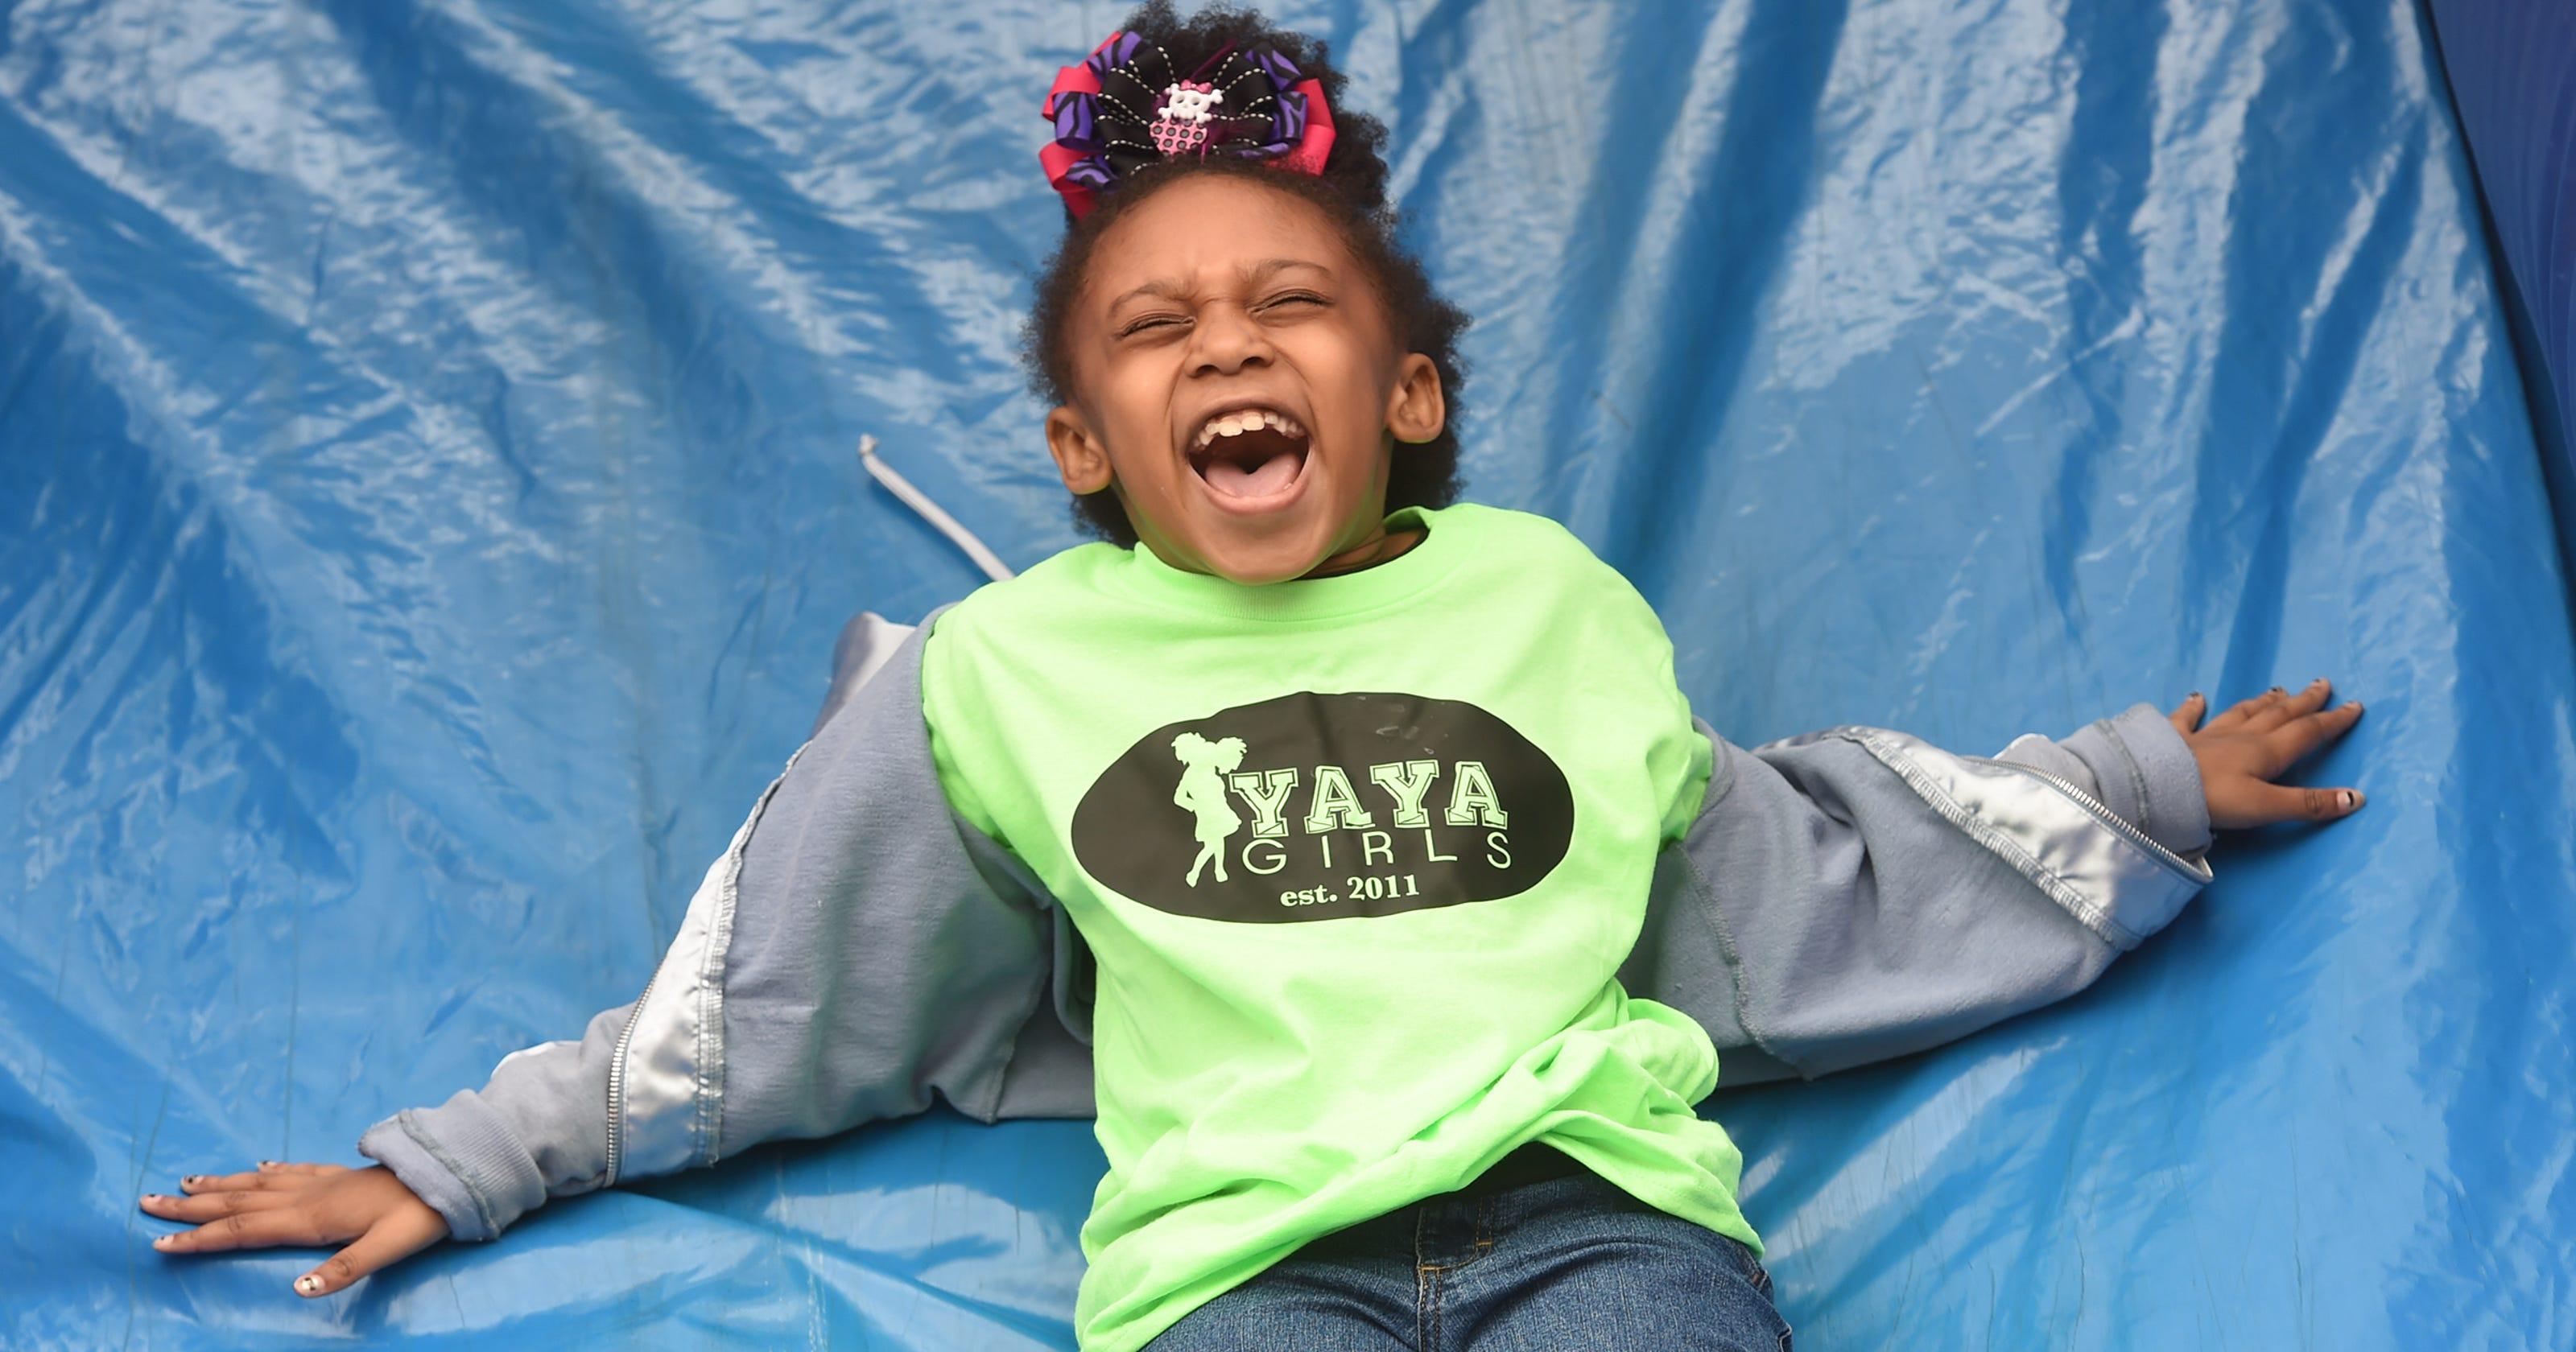 Paraders Celebrate York City Schools